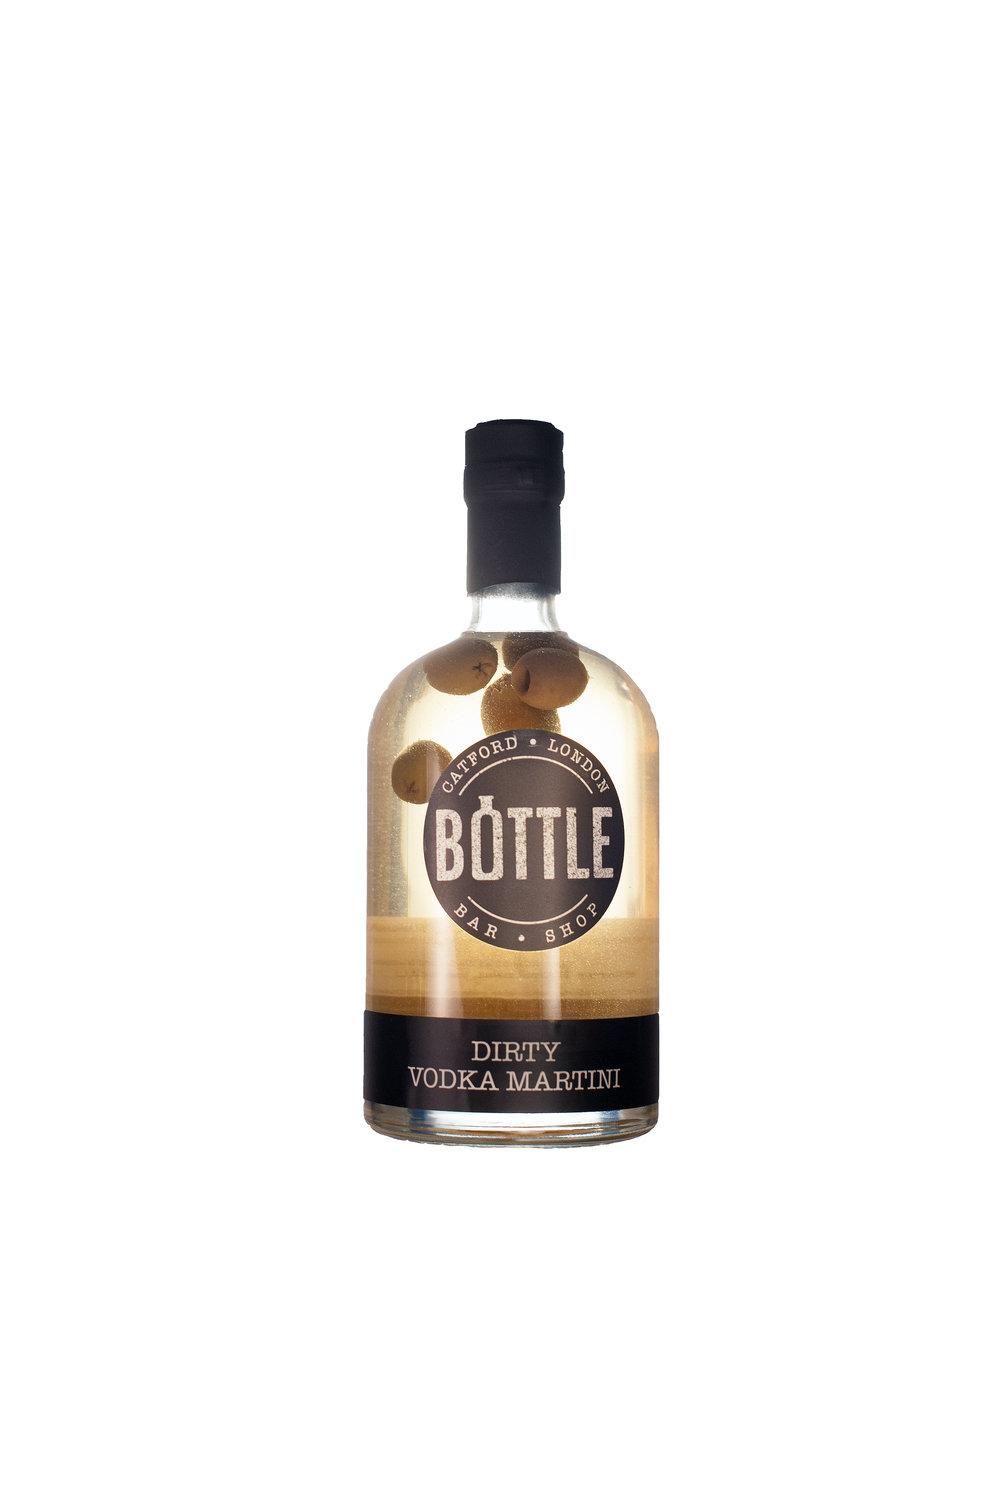 5060652340140_Bottle_Bar_and_Shop_DirtyVodkaMartini_500ml.jpg